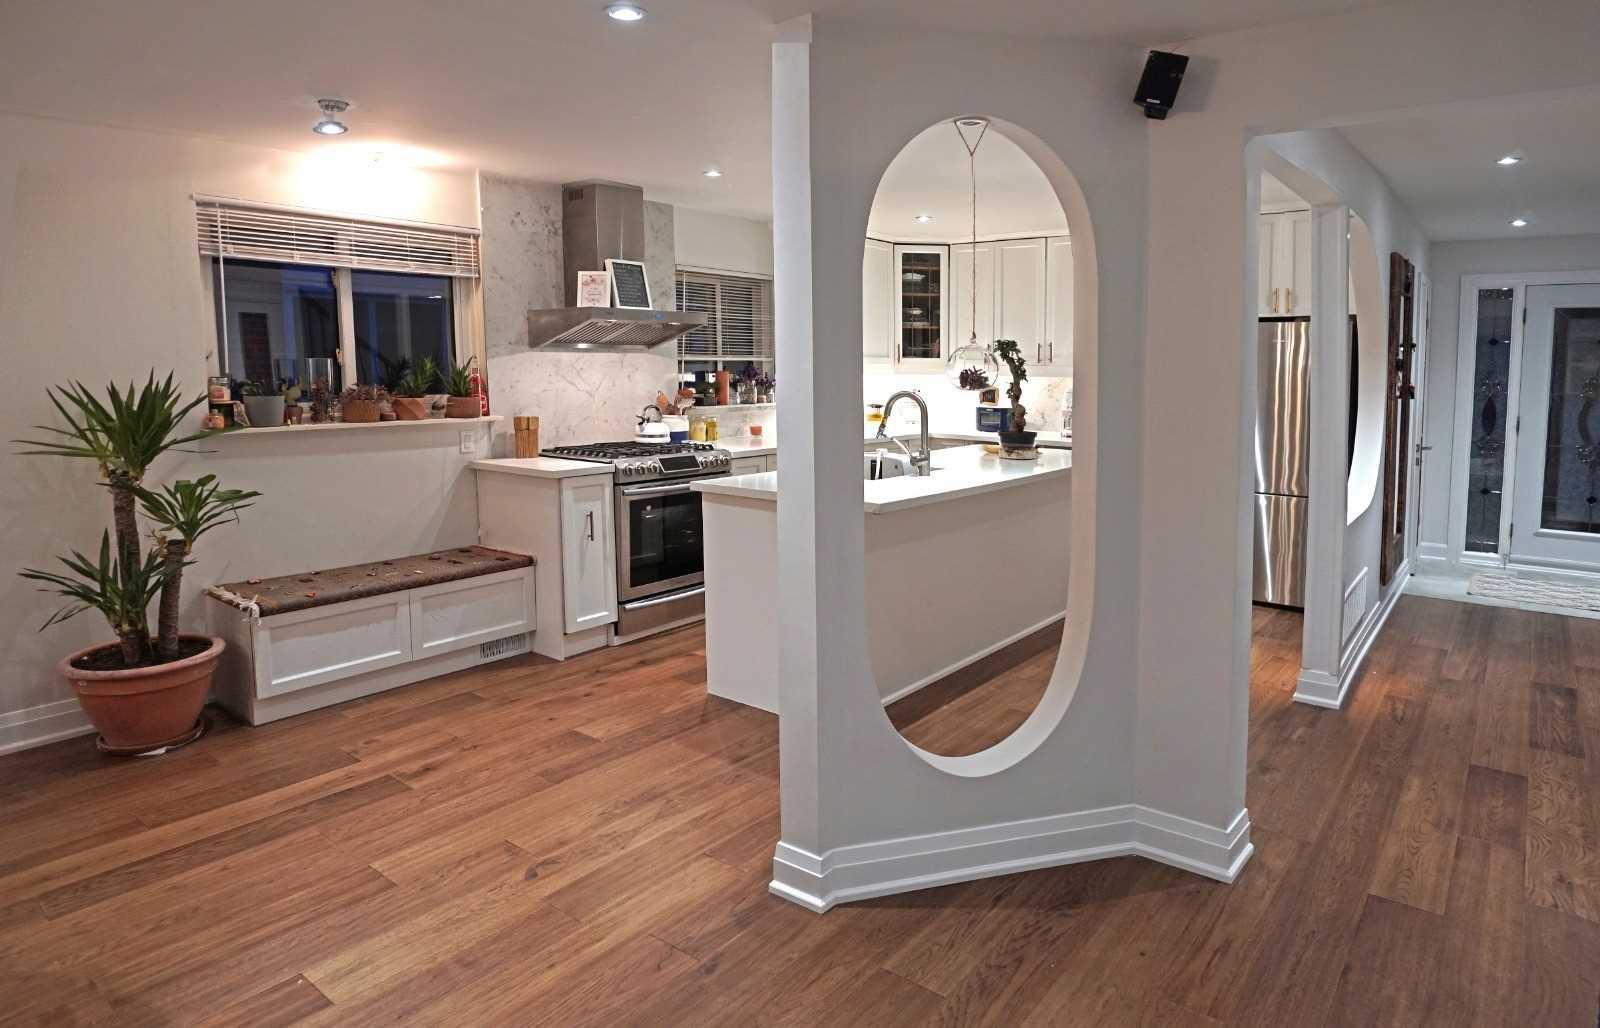 152 Glen Springs Dr, Toronto, Ontario M1W1X8, 4 Bedrooms Bedrooms, 7 Rooms Rooms,4 BathroomsBathrooms,Link,For Sale,Glen Springs,E5194142